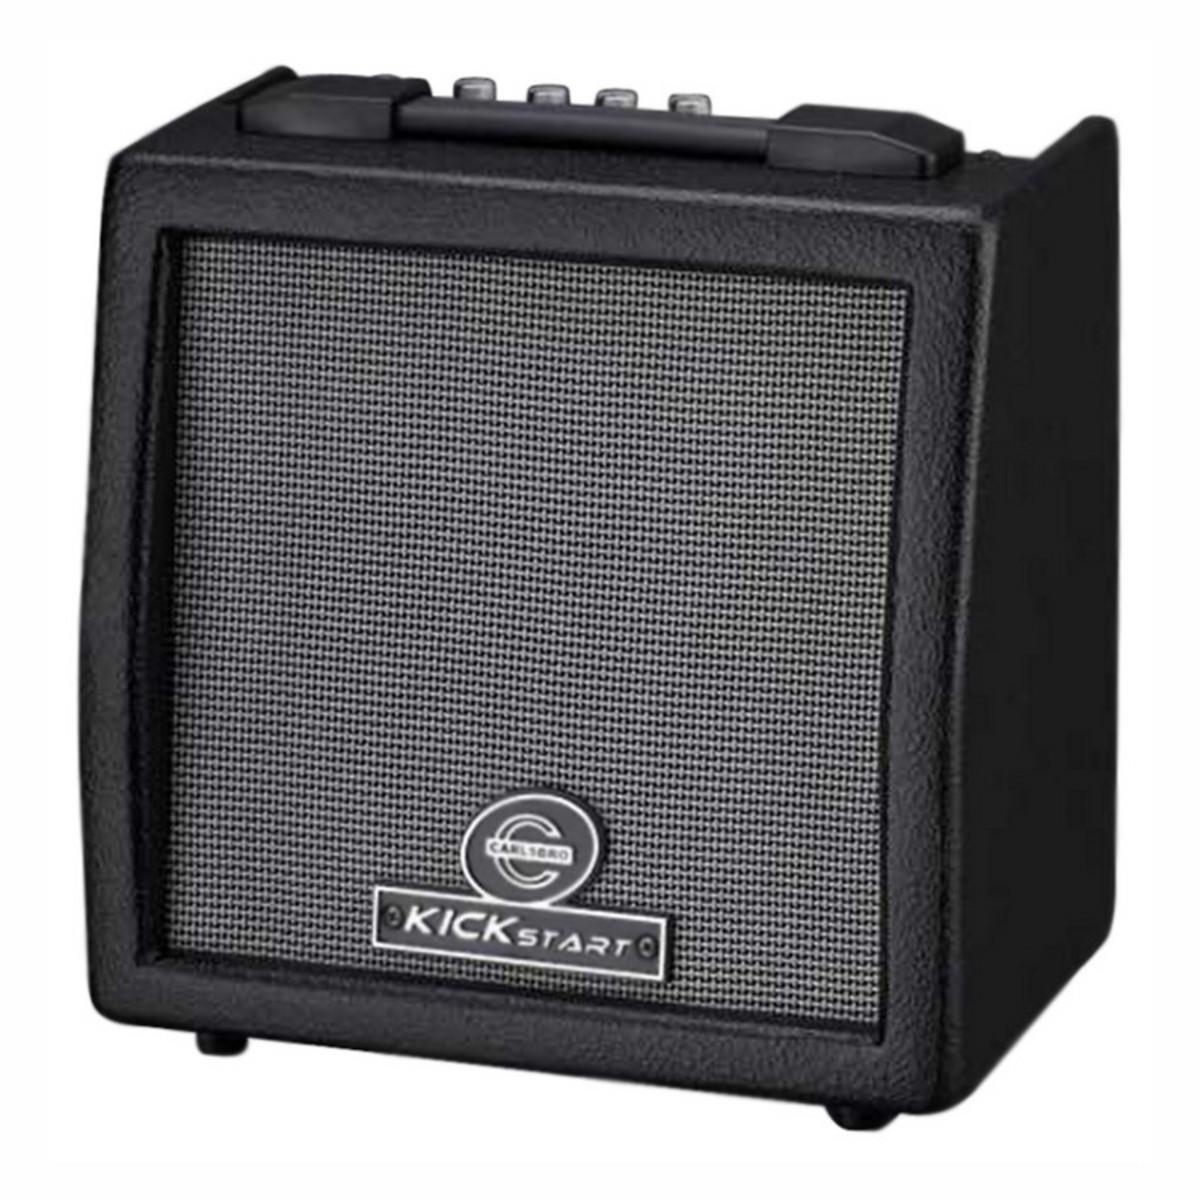 discontinued carlsbro kickstart 10 12w guitar amp combo at. Black Bedroom Furniture Sets. Home Design Ideas